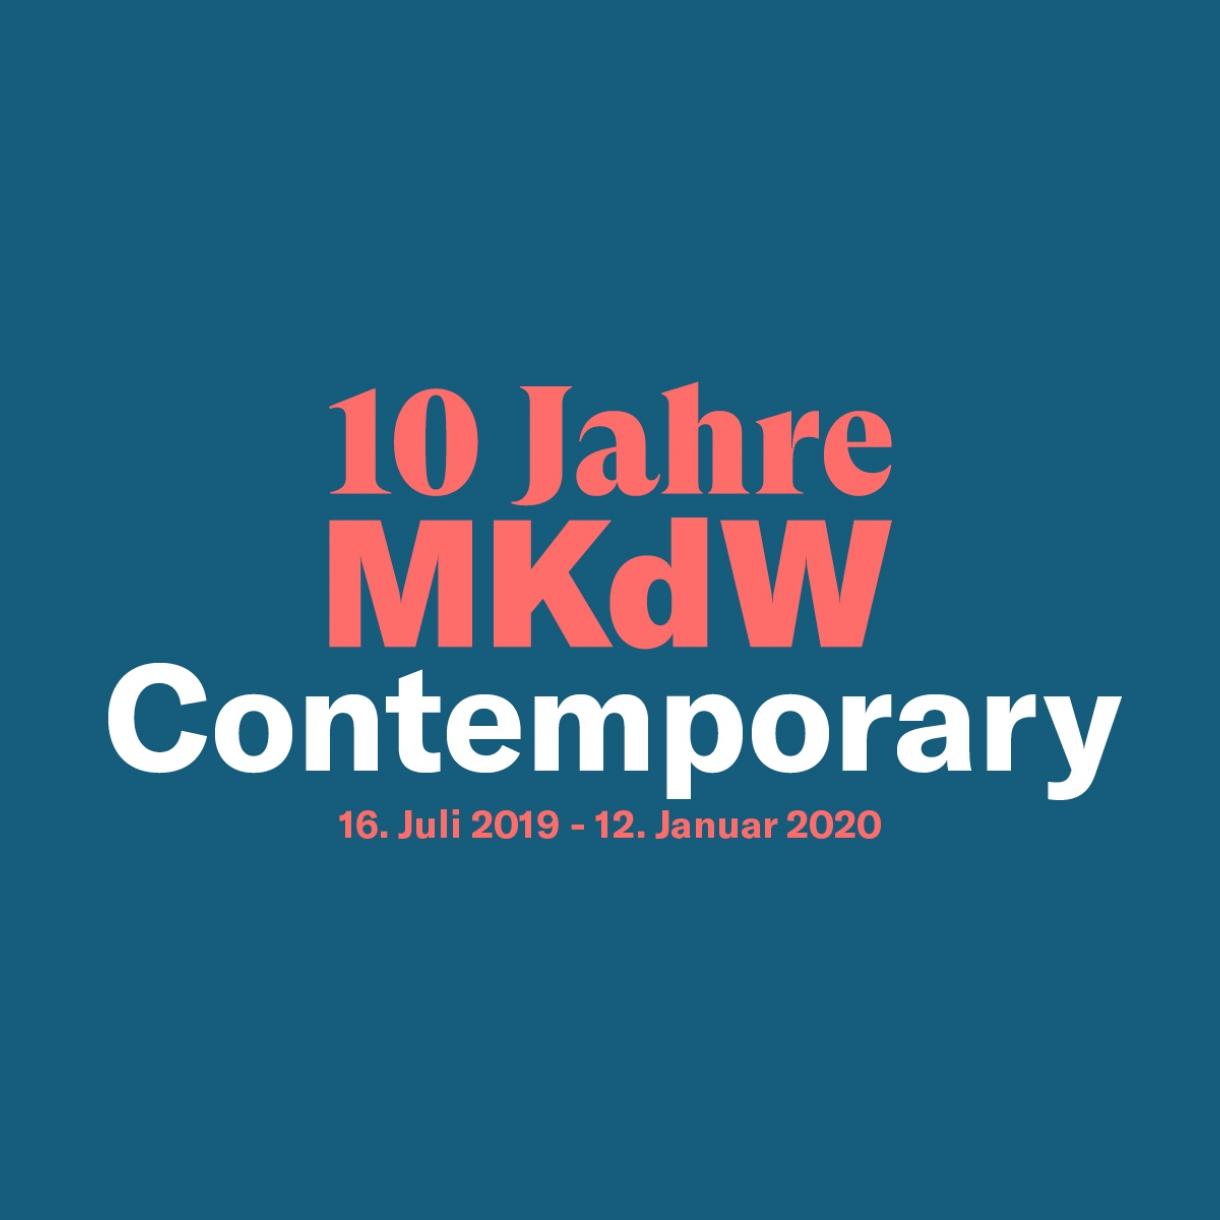 10 Jahre MKdW Contemporary